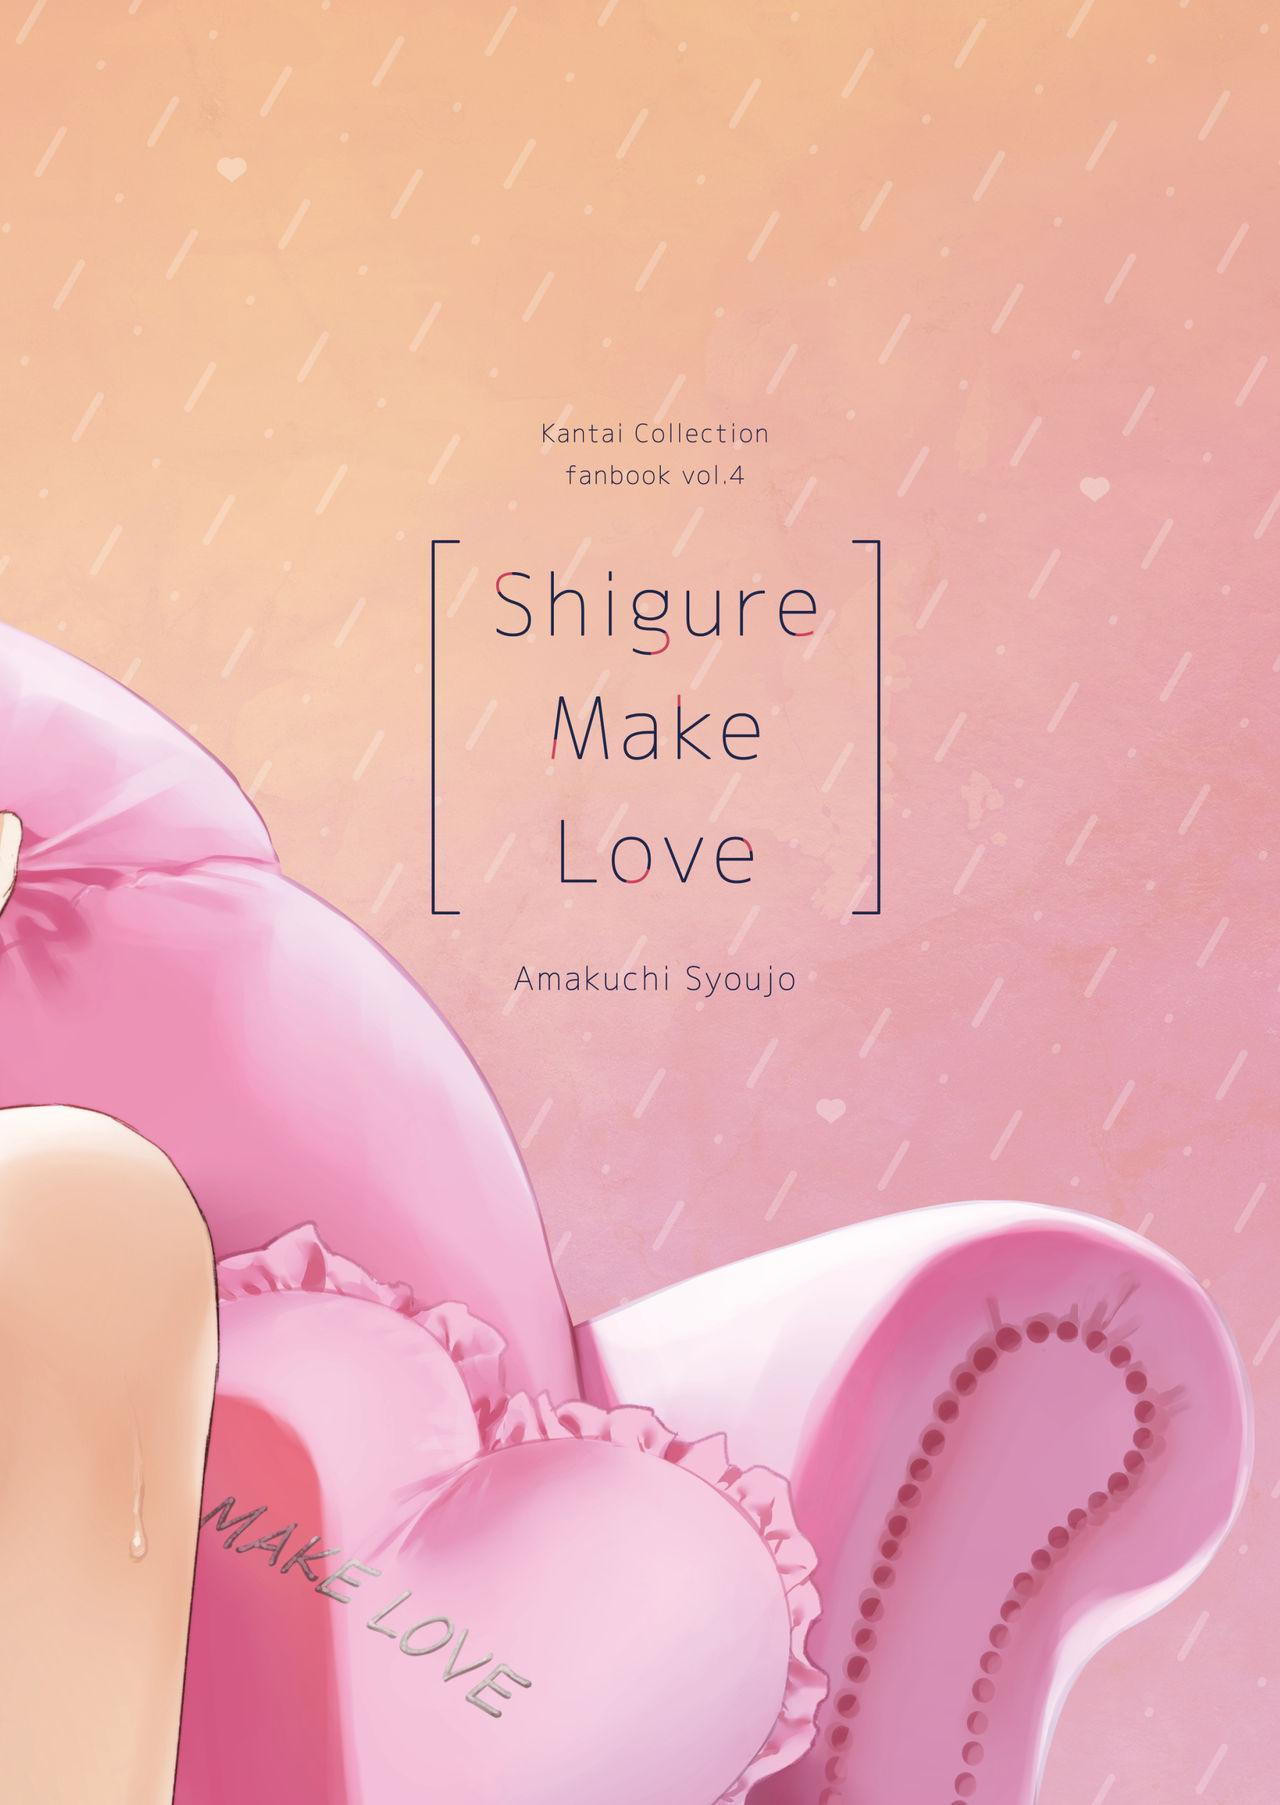 Shigure Make Love 28